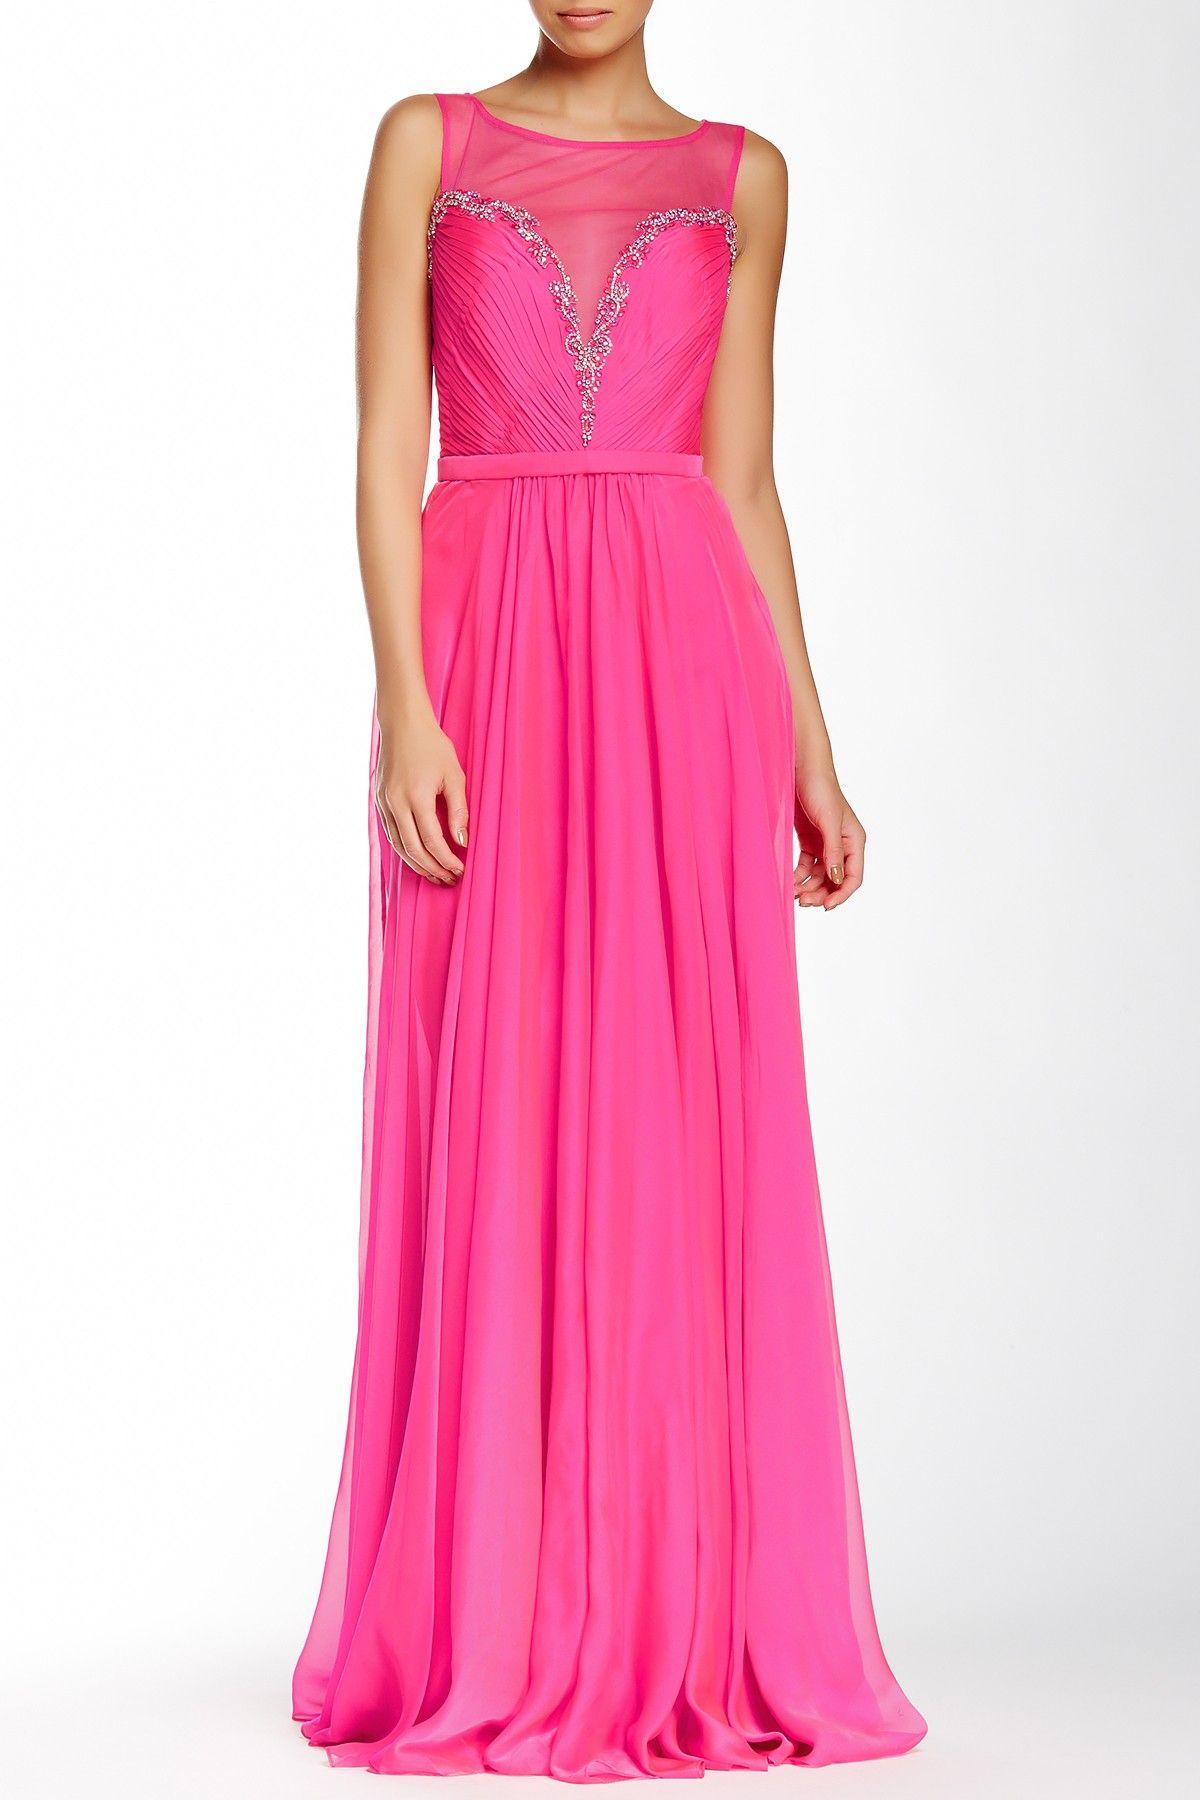 Hot Pink La Femme Beaded Bodice Gown | Looks We Love | Pinterest ...